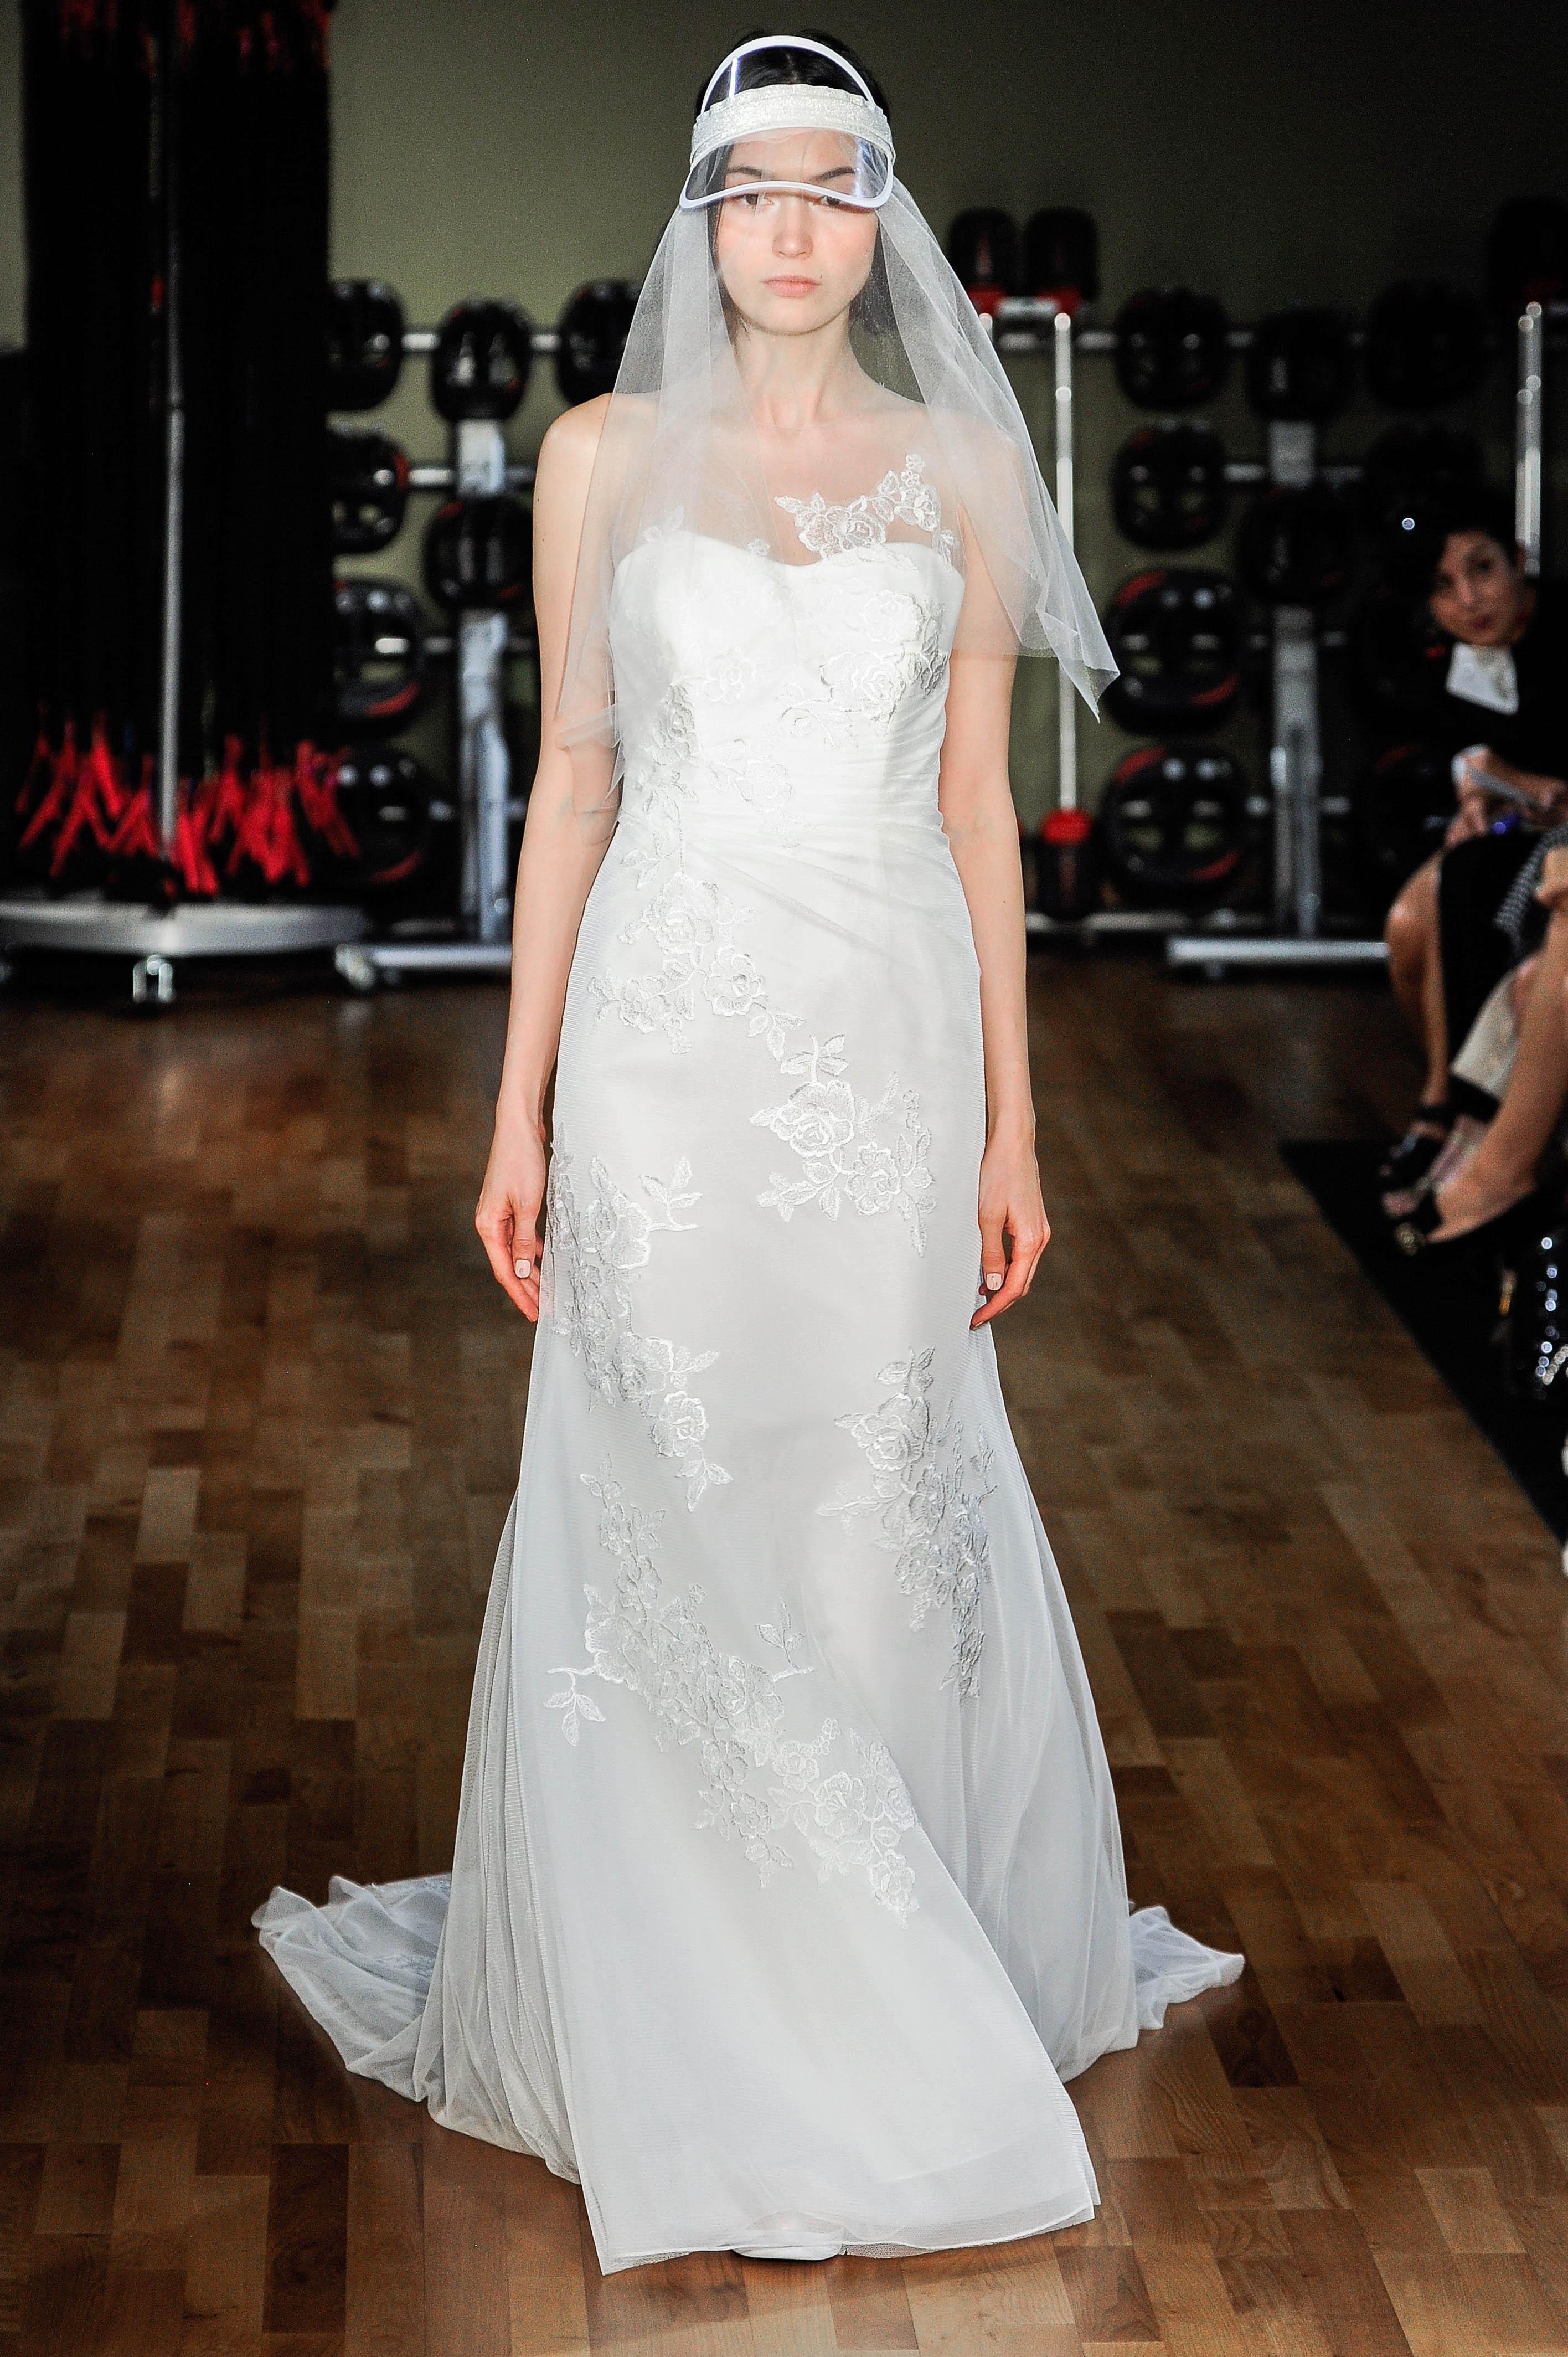 rivini by rita vinieris wedding dress fall 2018 strapless lace veil hat